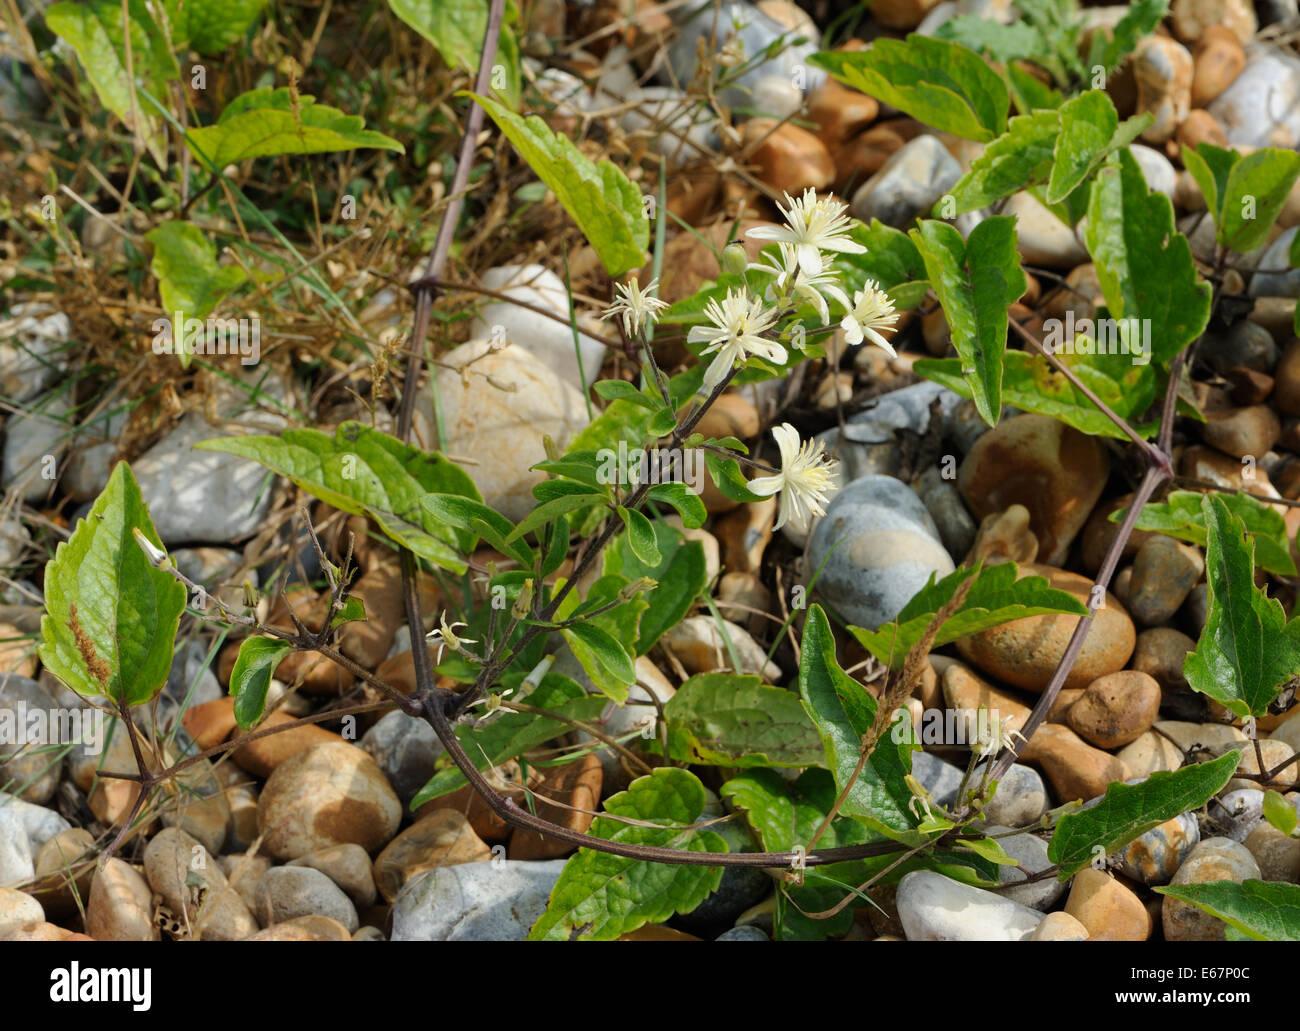 Very subdued plants of old man's beard or traveller's joy (Clematis vitalba) growing on very poor soil in shingle Stock Photo